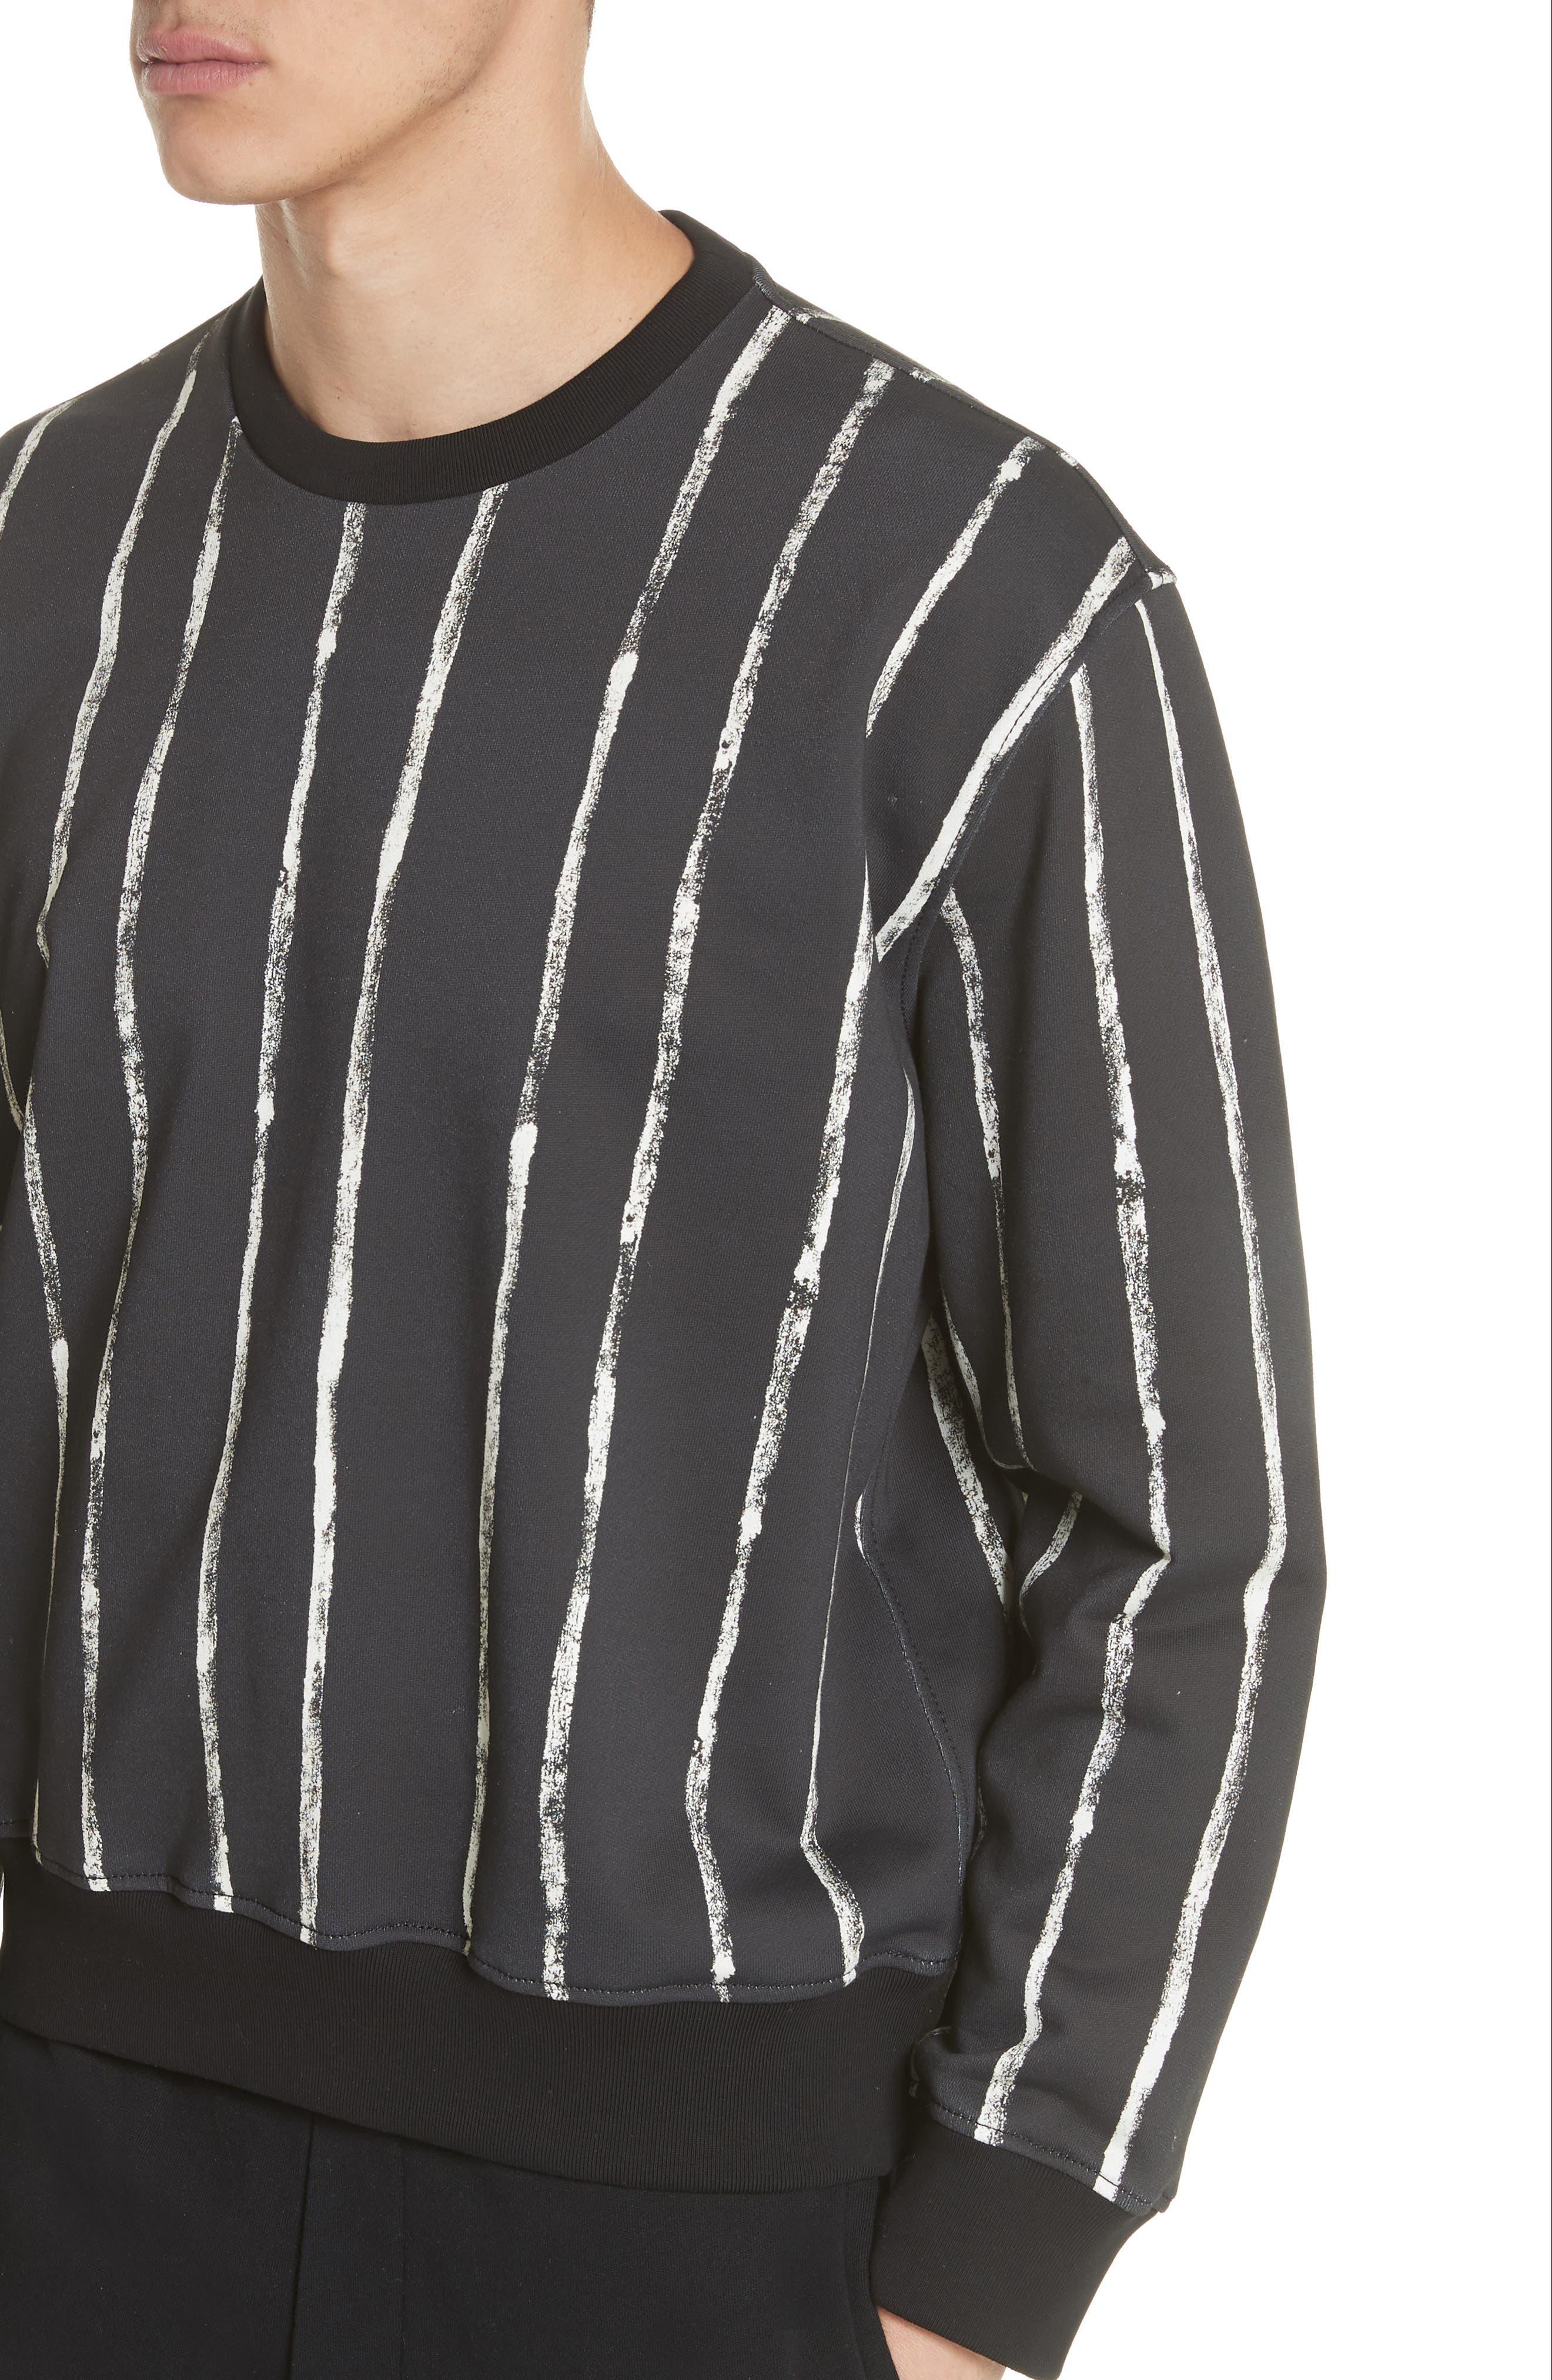 Paint Stripe Crewneck Sweatshirt,                             Alternate thumbnail 4, color,                             Black/ White